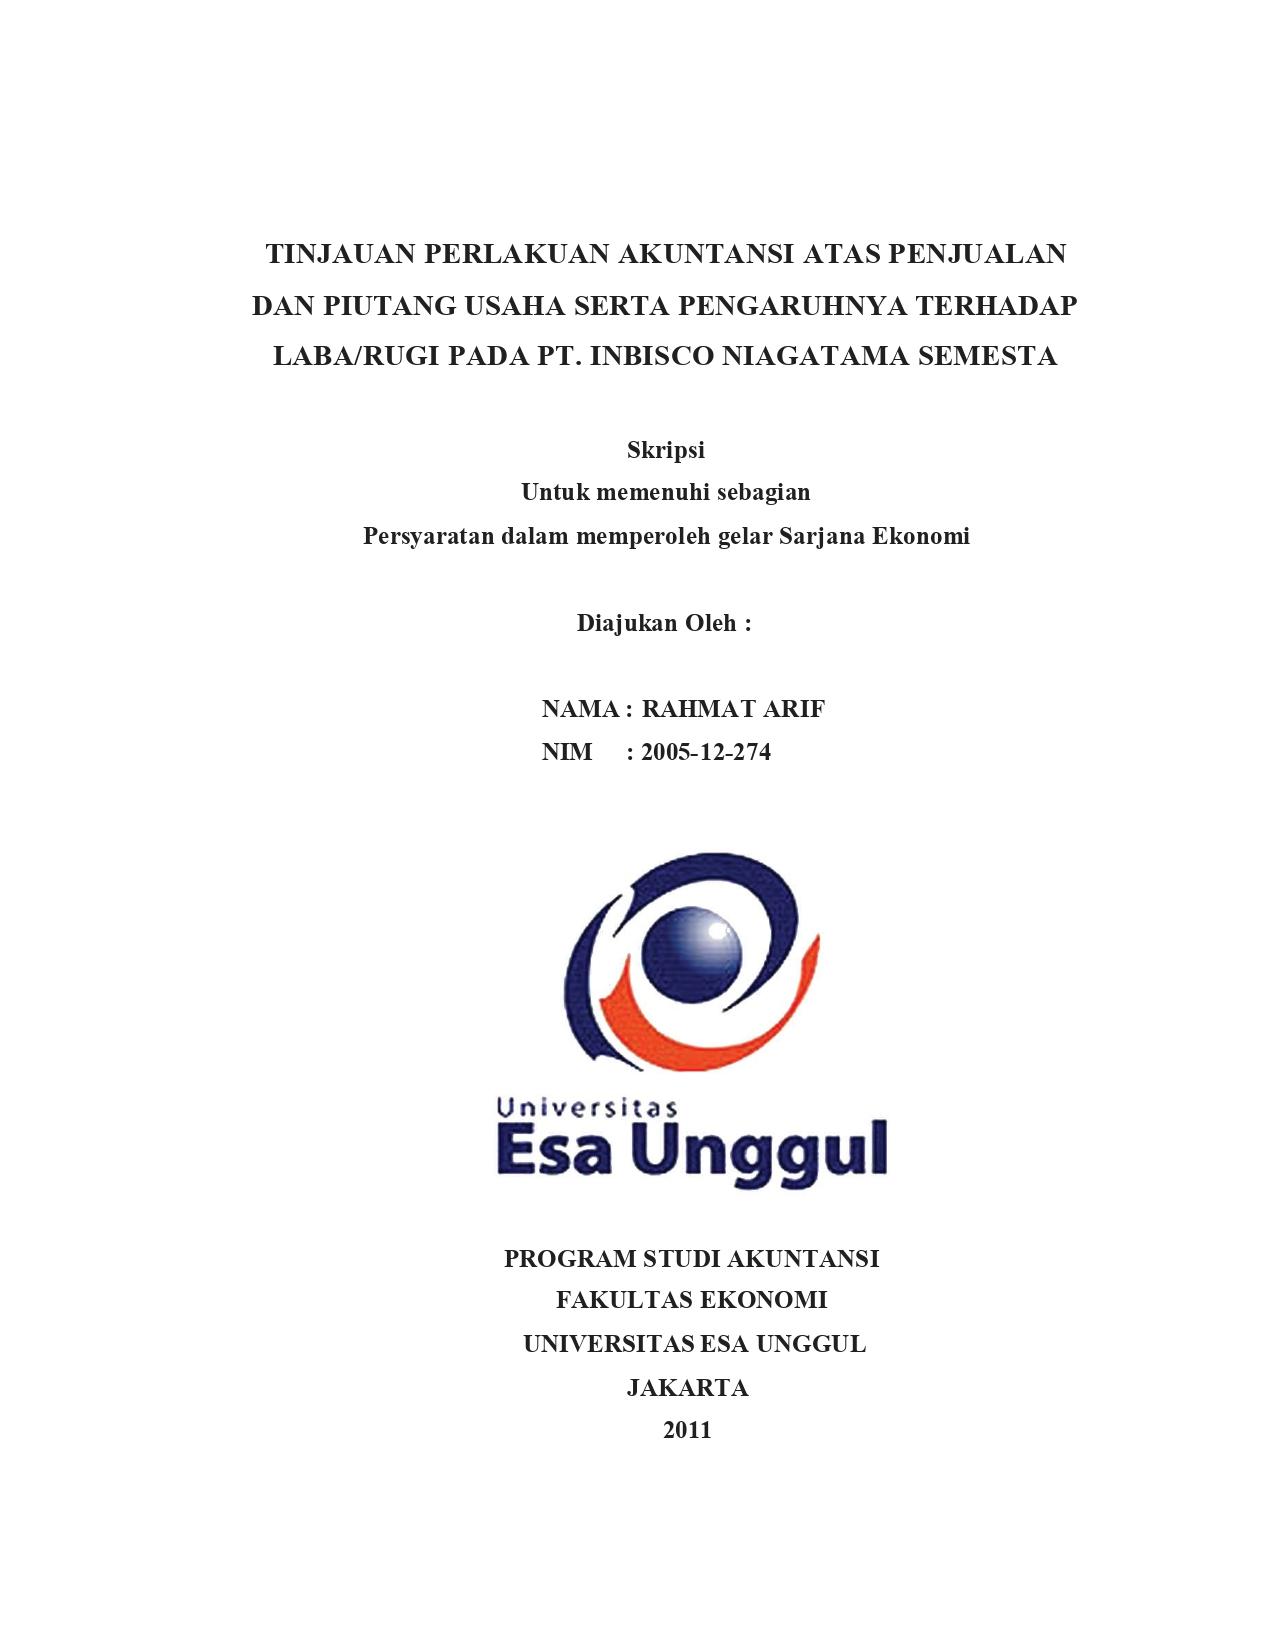 Tinjauan Perlakuan Akuntansi atas Penjualan dan Piutang Usaha serta Pengaruhnya Terhadap Laba/Rugi pada Pt. Inbisco Niagatama Semesta